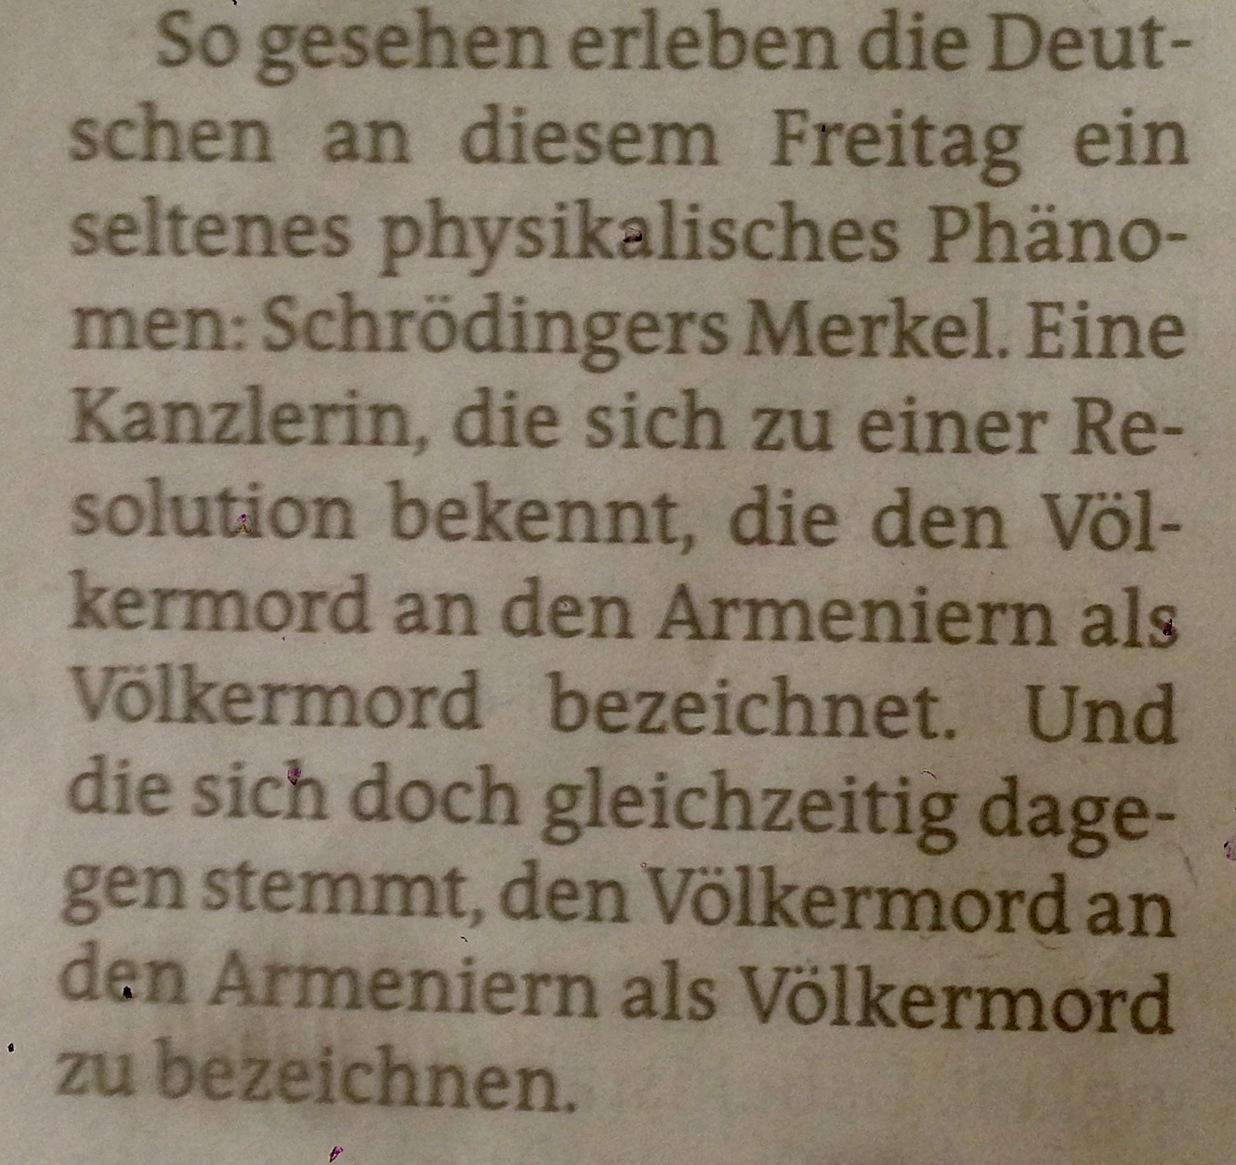 Schrödingers Merkel.   https://de.wikipedia.org/wiki/Schr%C3%B6dingers_Katze   @taz